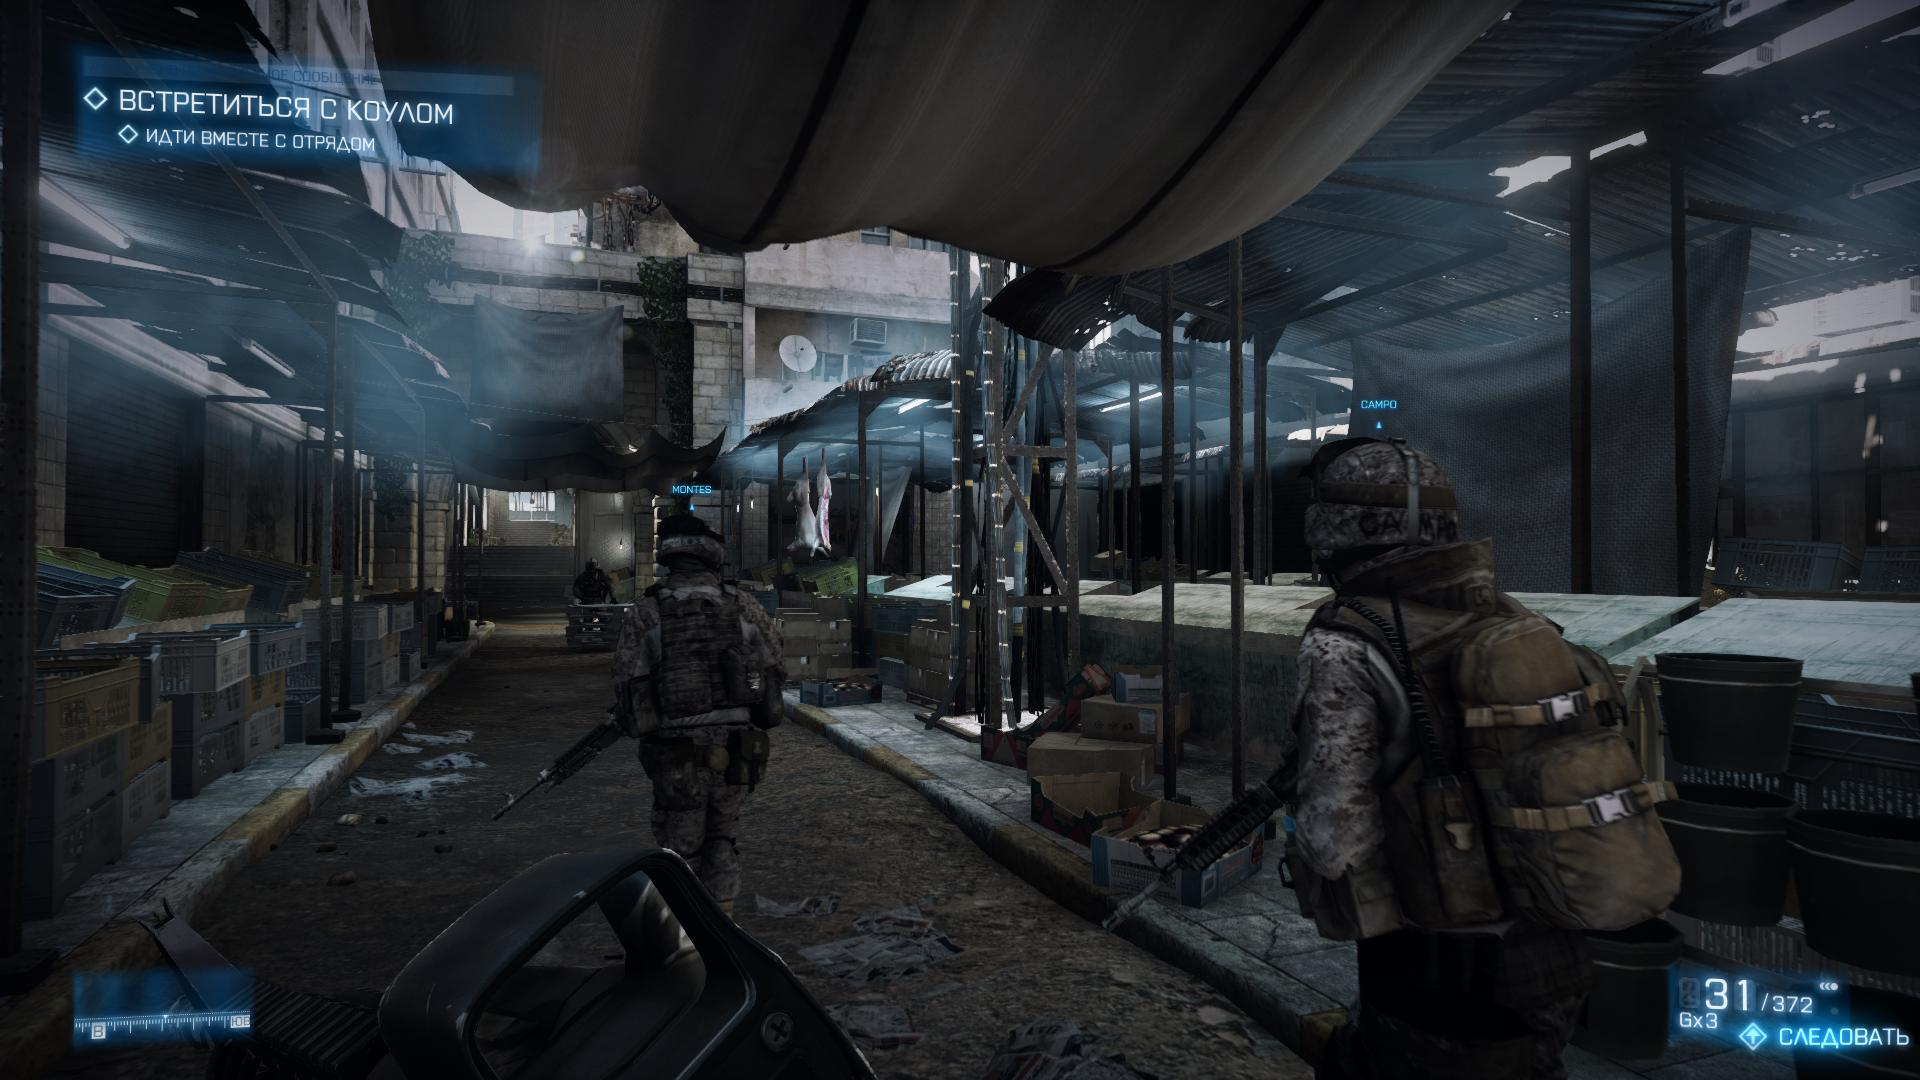 Battlefield 3 [v7 0 4 0 + ALL DLC] [MP-ZloEMU] [SP] [Rus\Multi